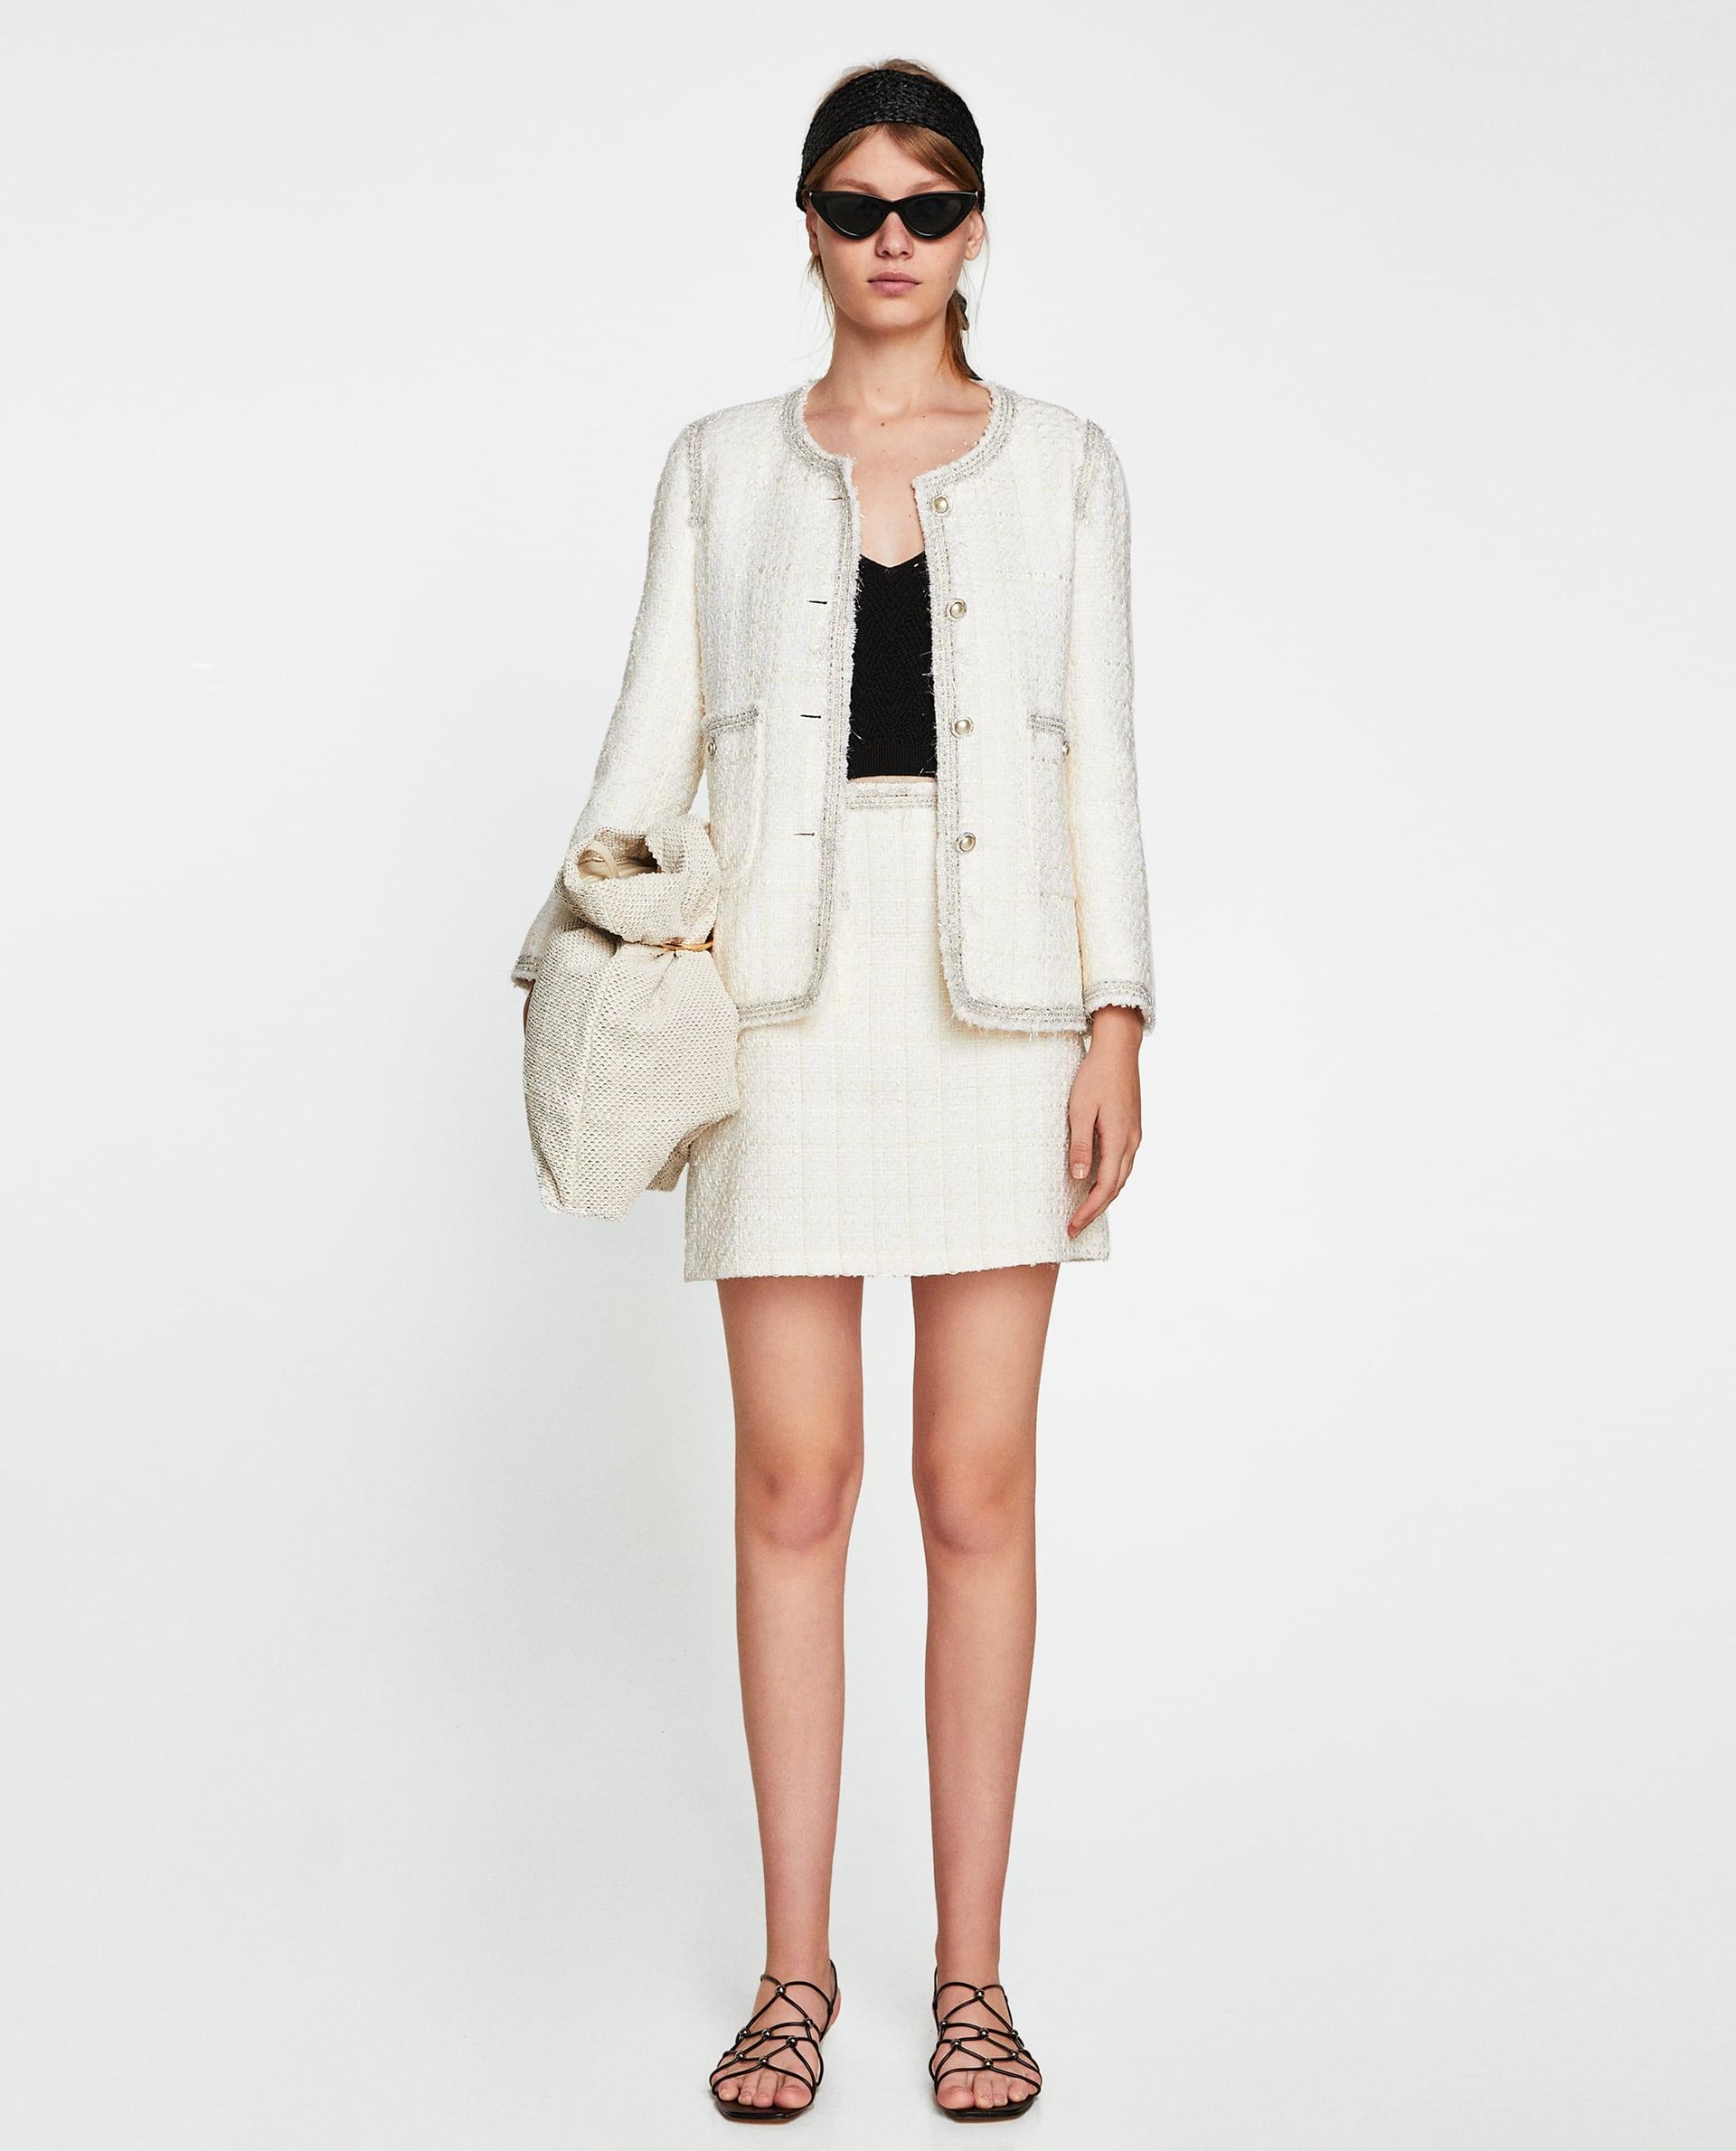 0edbf1146 New Mini Skirt Suit Workwear Trend, Summer Trends 2018